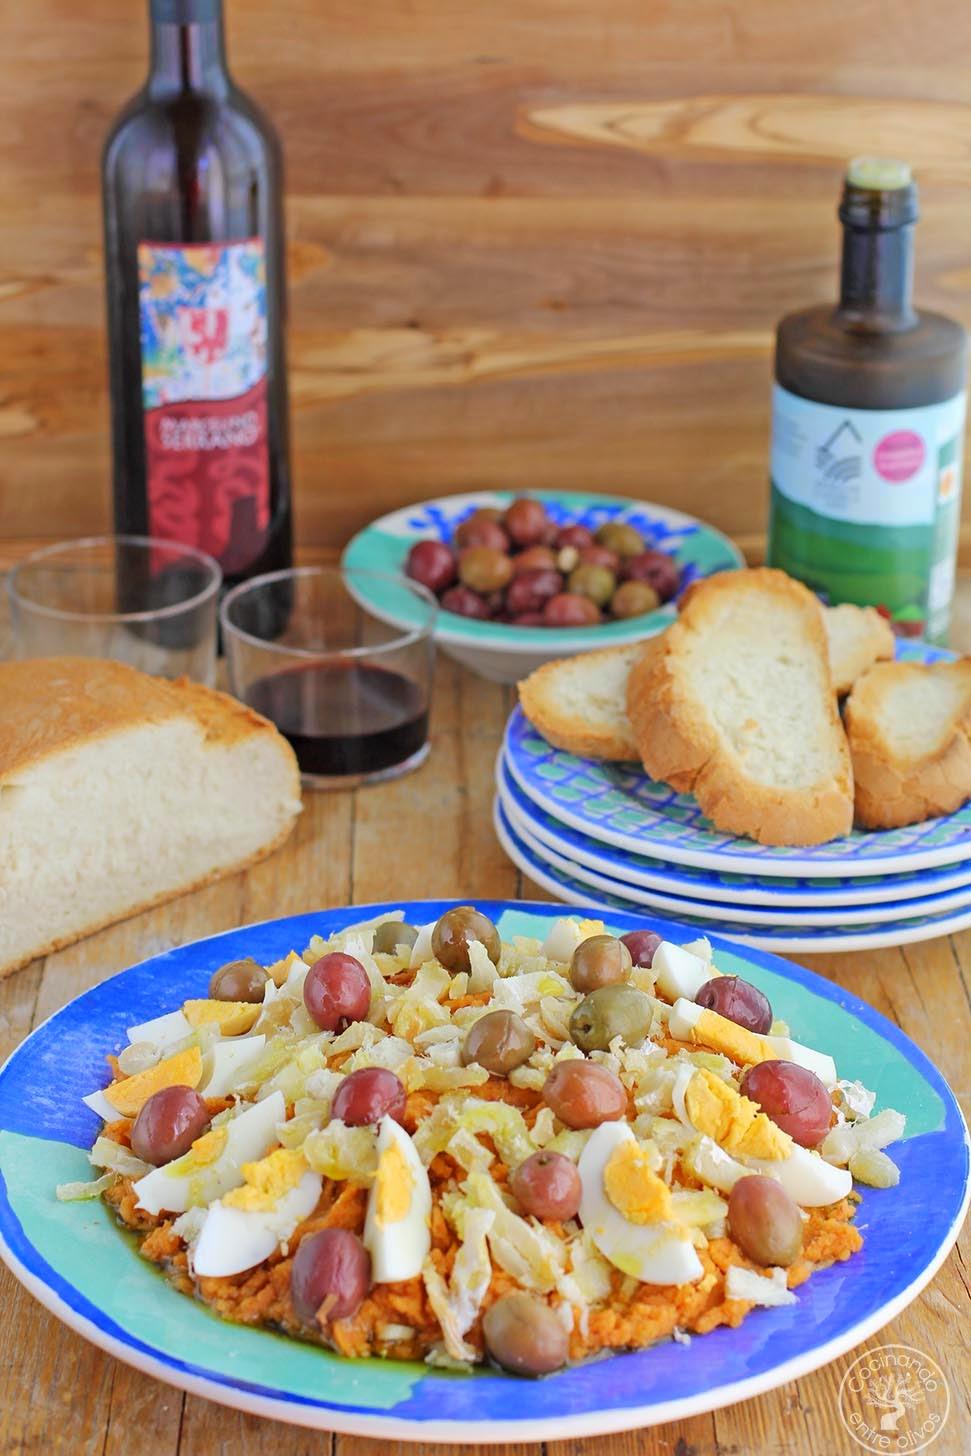 Cocinando entre olivos rin ran de cazorla receta paso a - Cocinando entre olivos ...